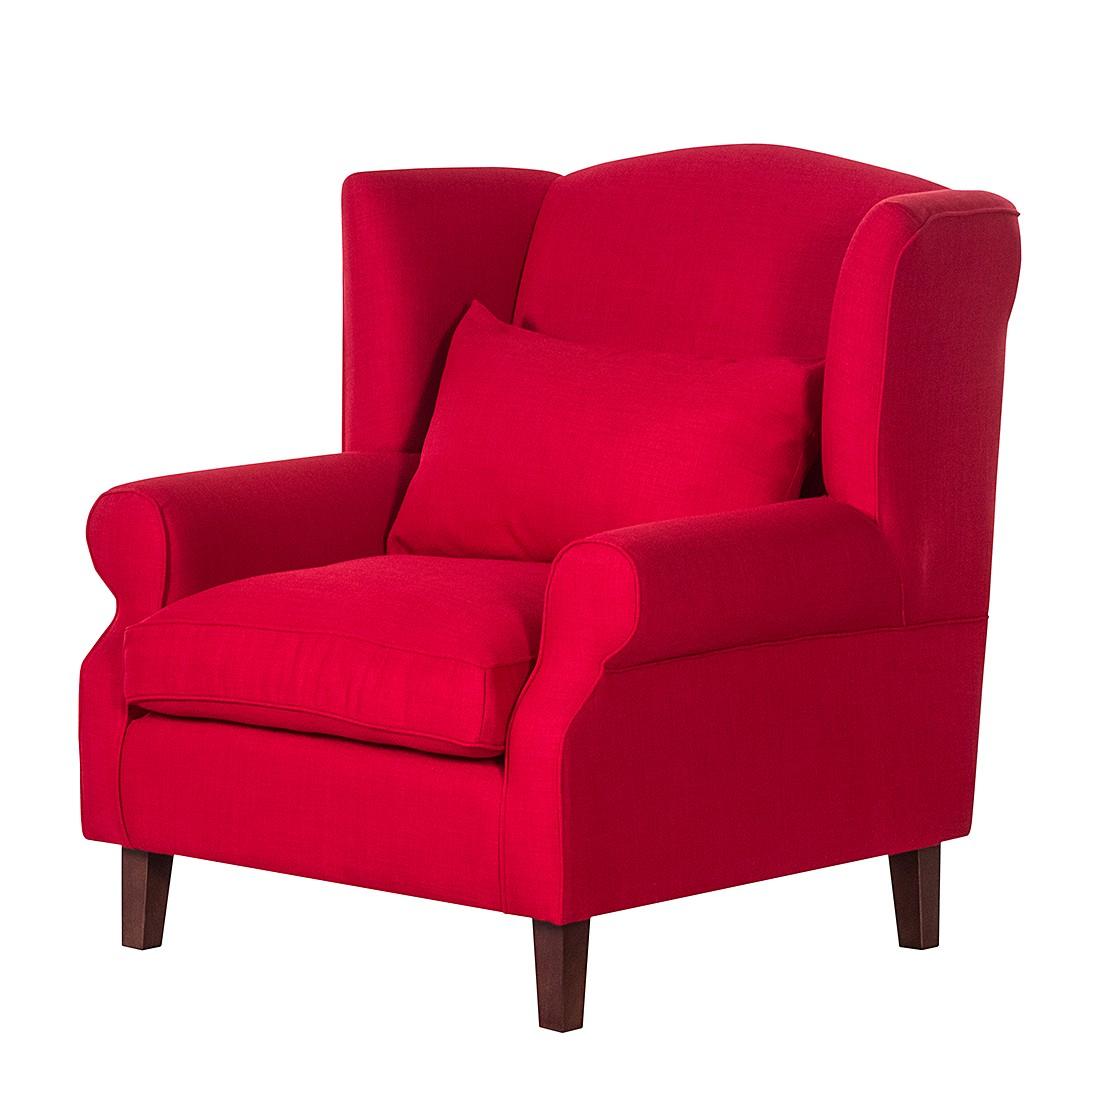 Ohrensessel Sofia – Webstoff Rot, Maison Belfort günstig